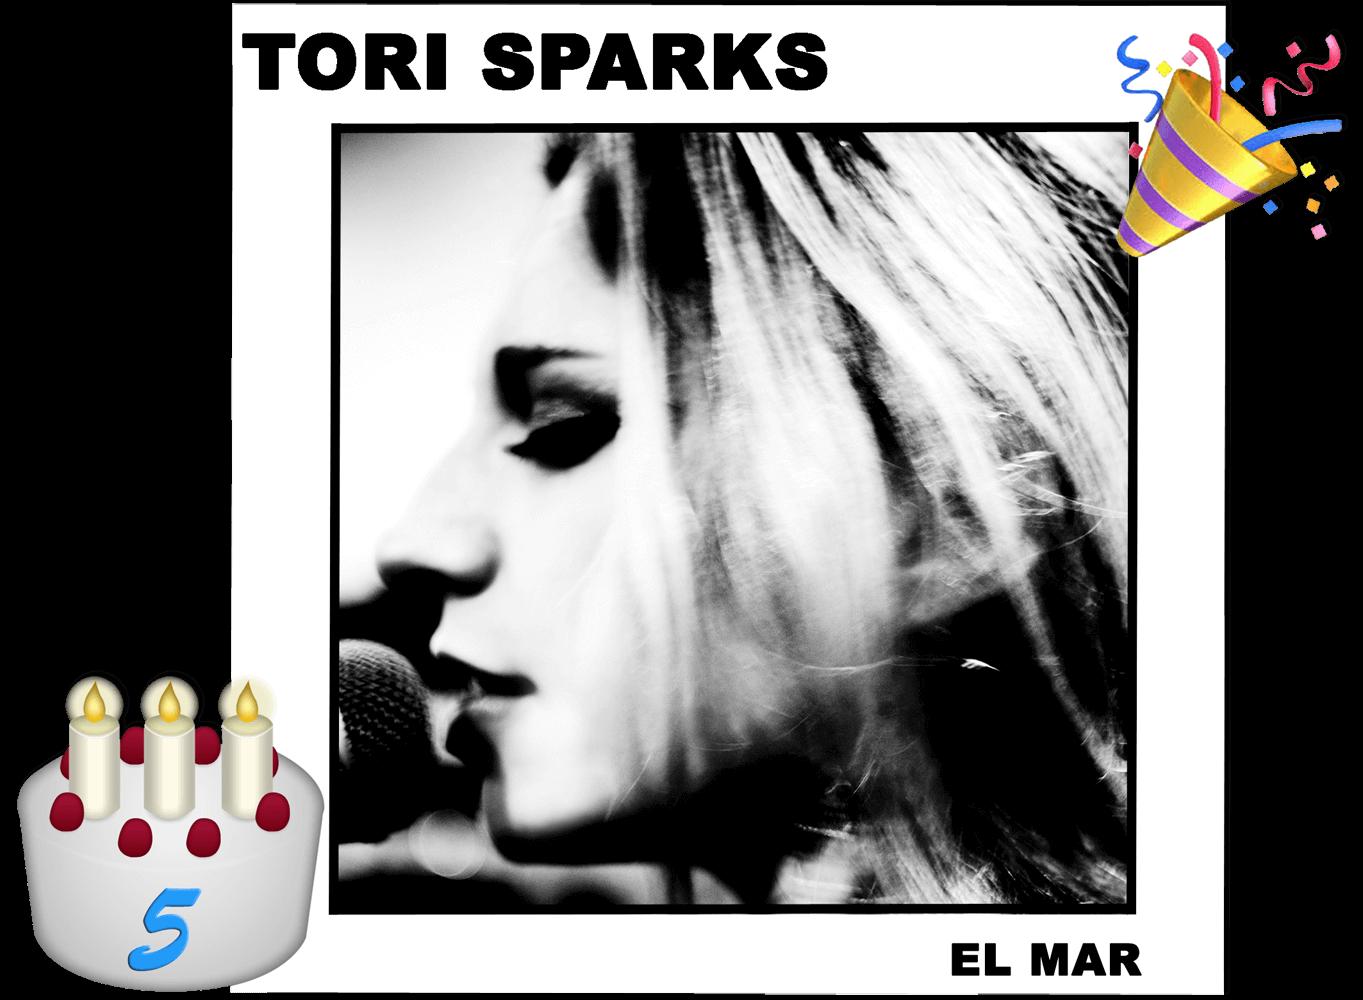 Tori Sparks El Mar turns 5 years old